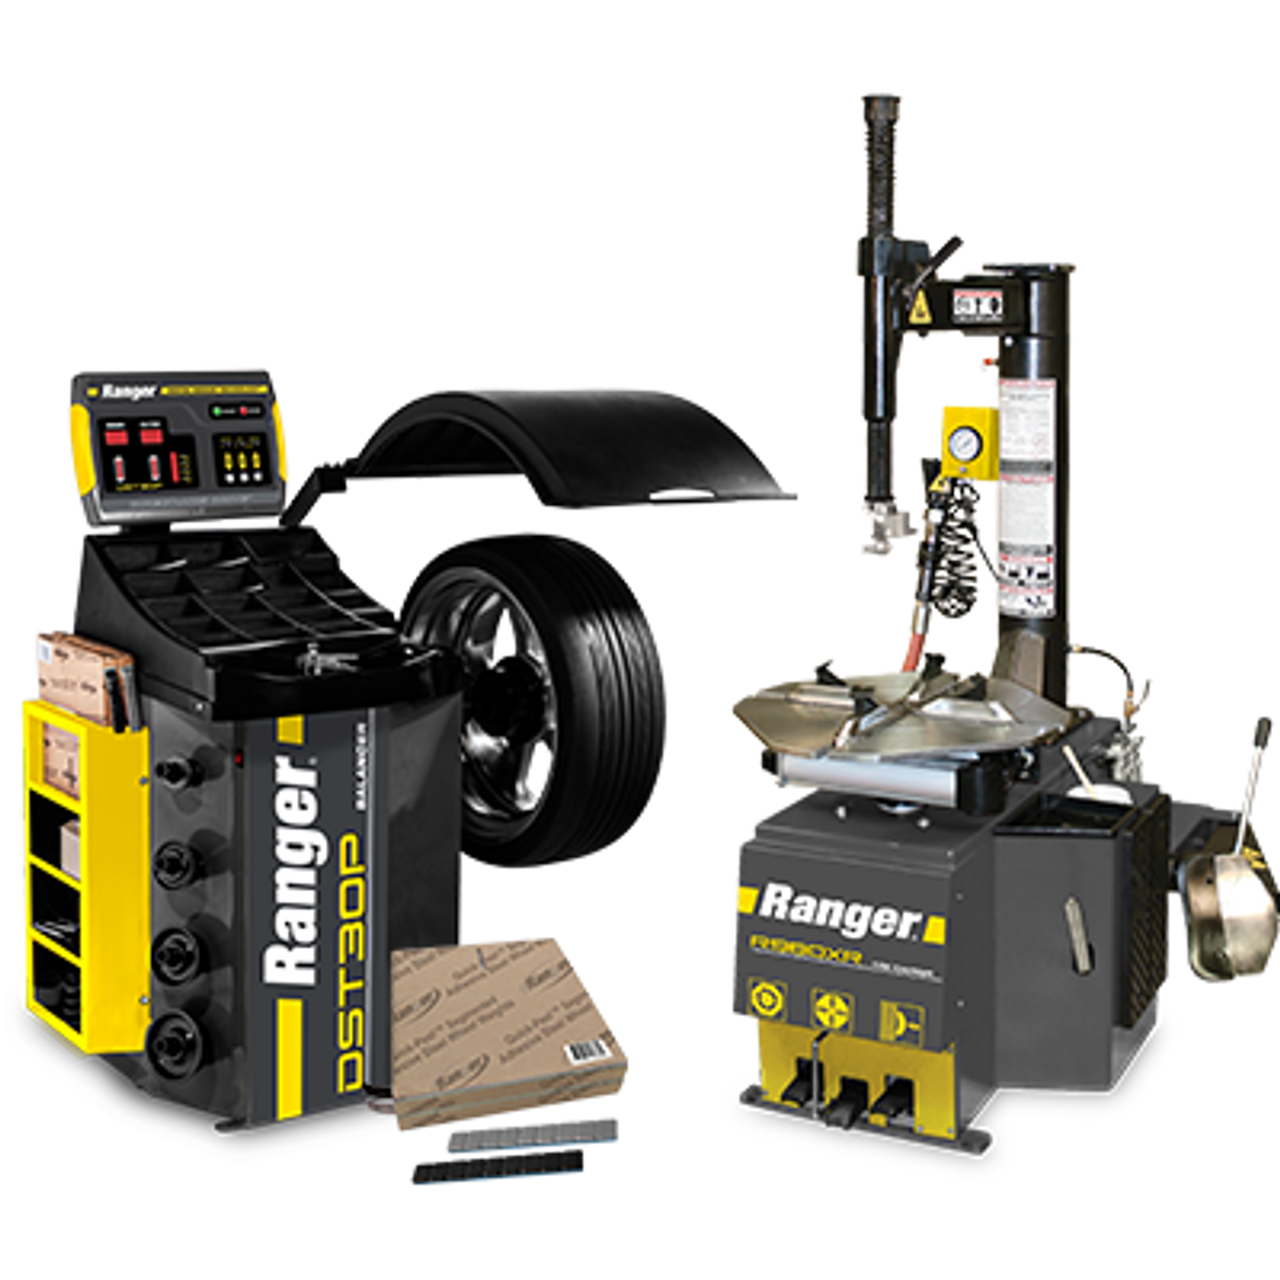 r980xr-dst30p-wheel-service-package-5140129